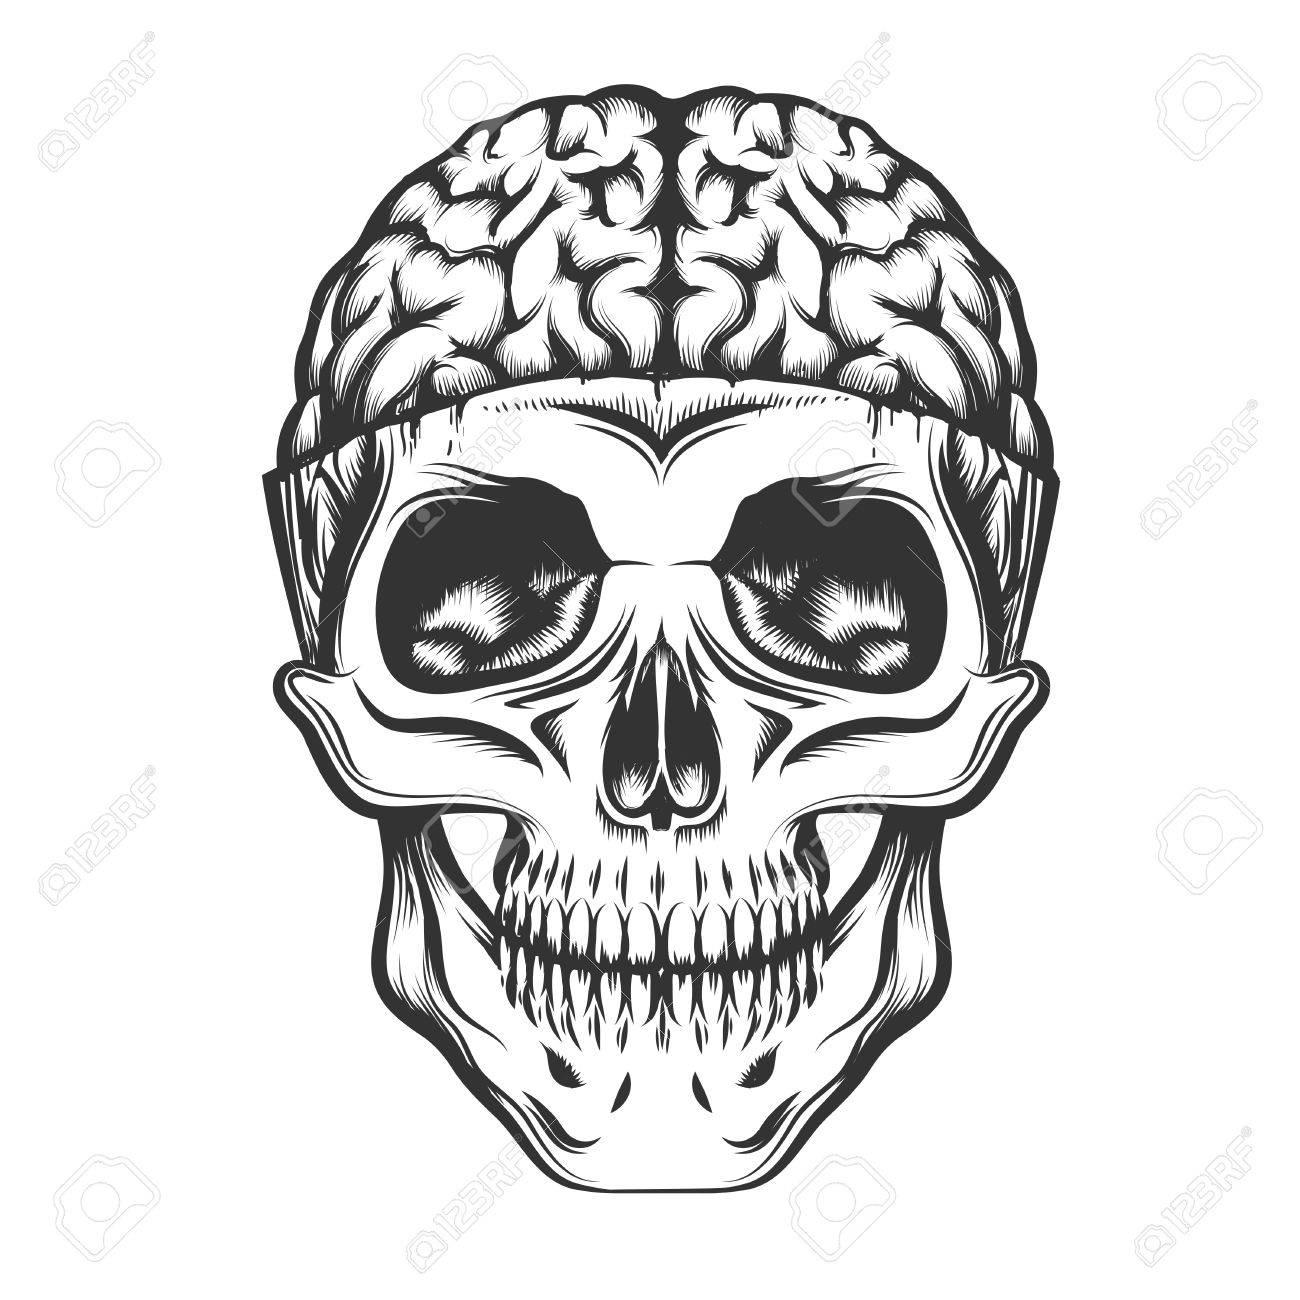 1300x1300 Human Skull With Open Brain. Vector Illustration In Tattoo Style